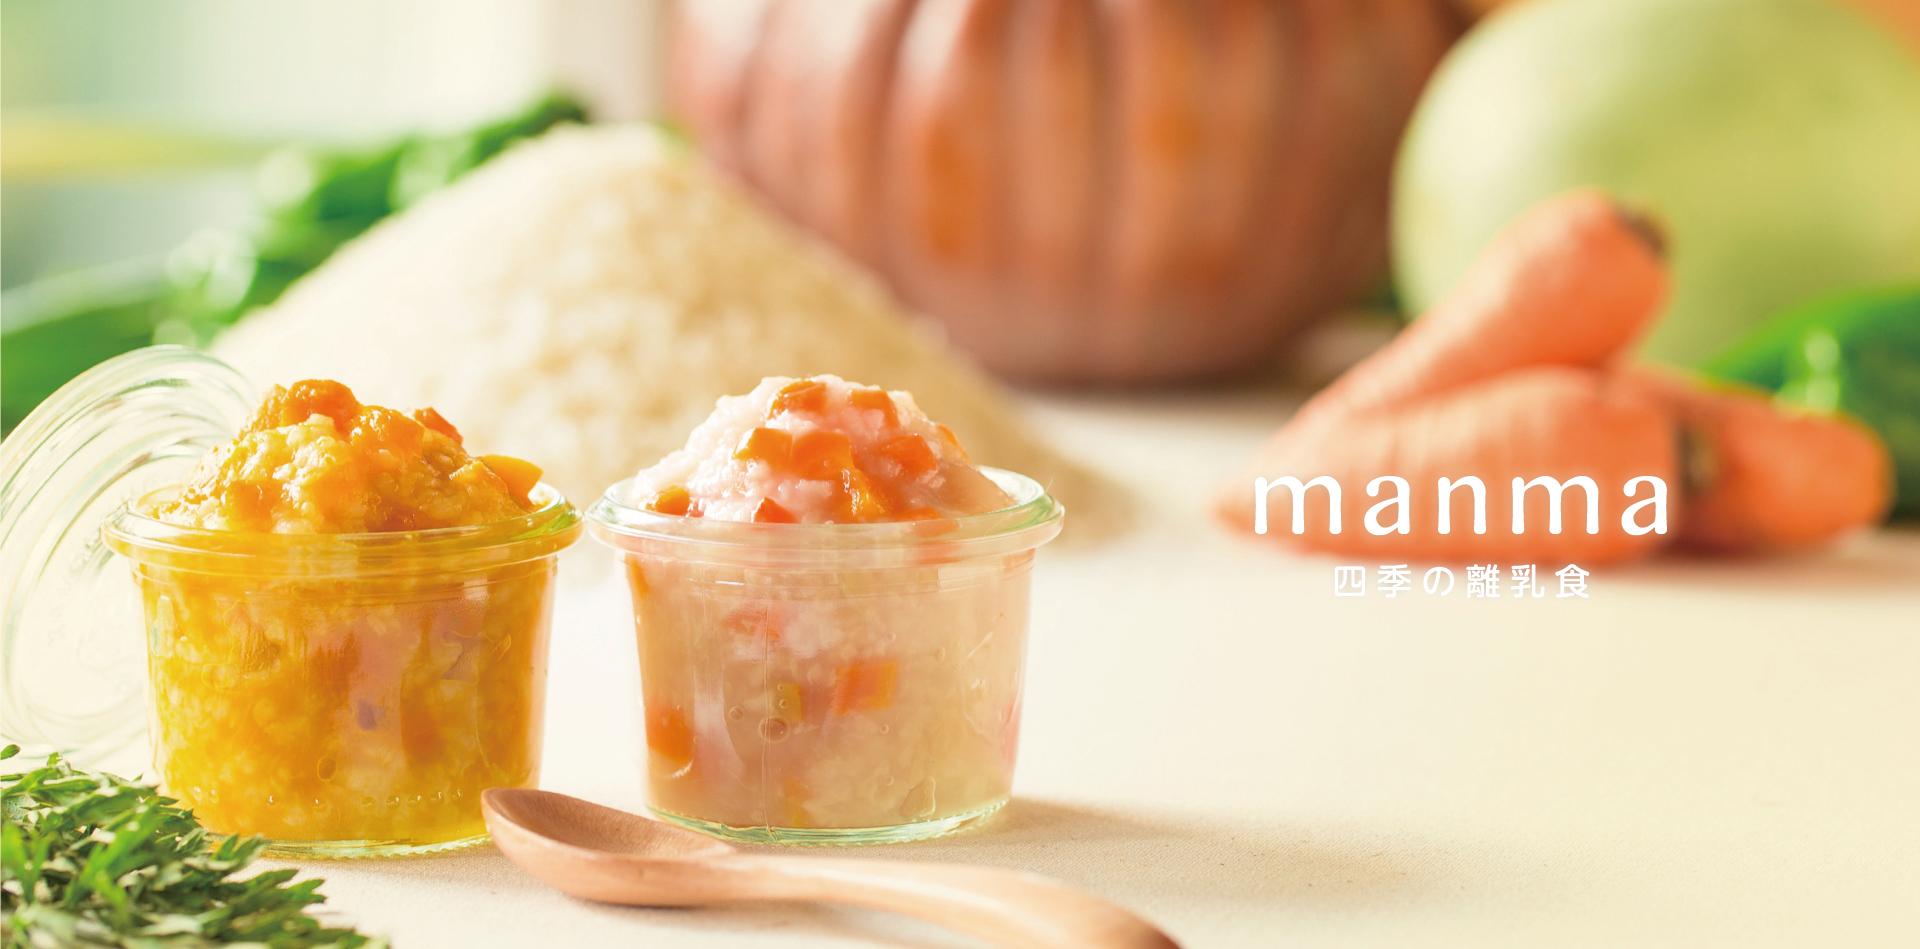 manma 四季の離乳食